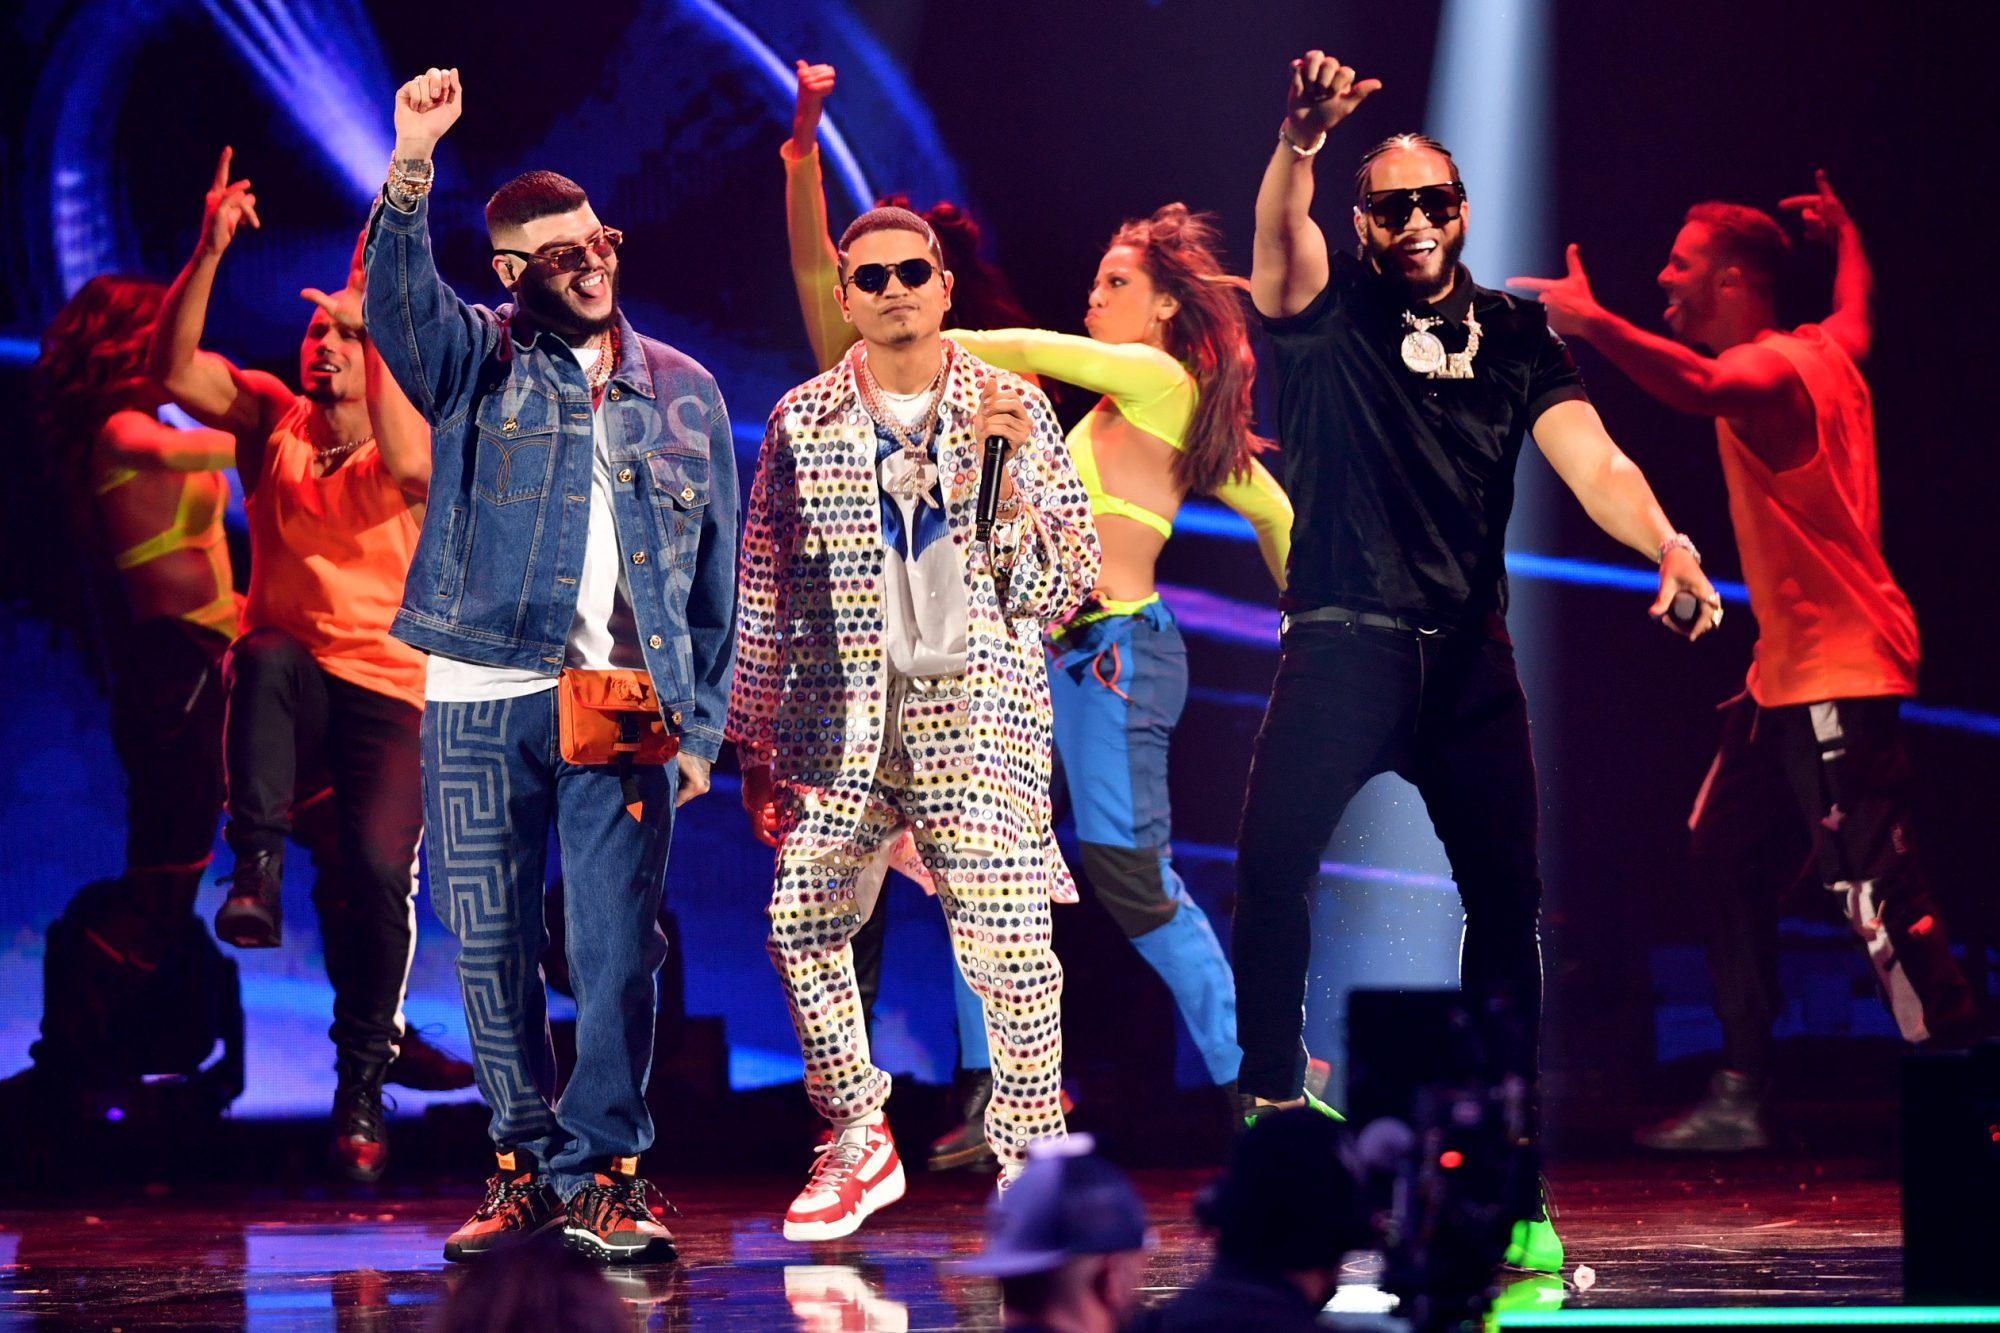 Farruko, Axel Rulay and El Alfa perform onstage at Premios Juventud 2021 at Watsco Center